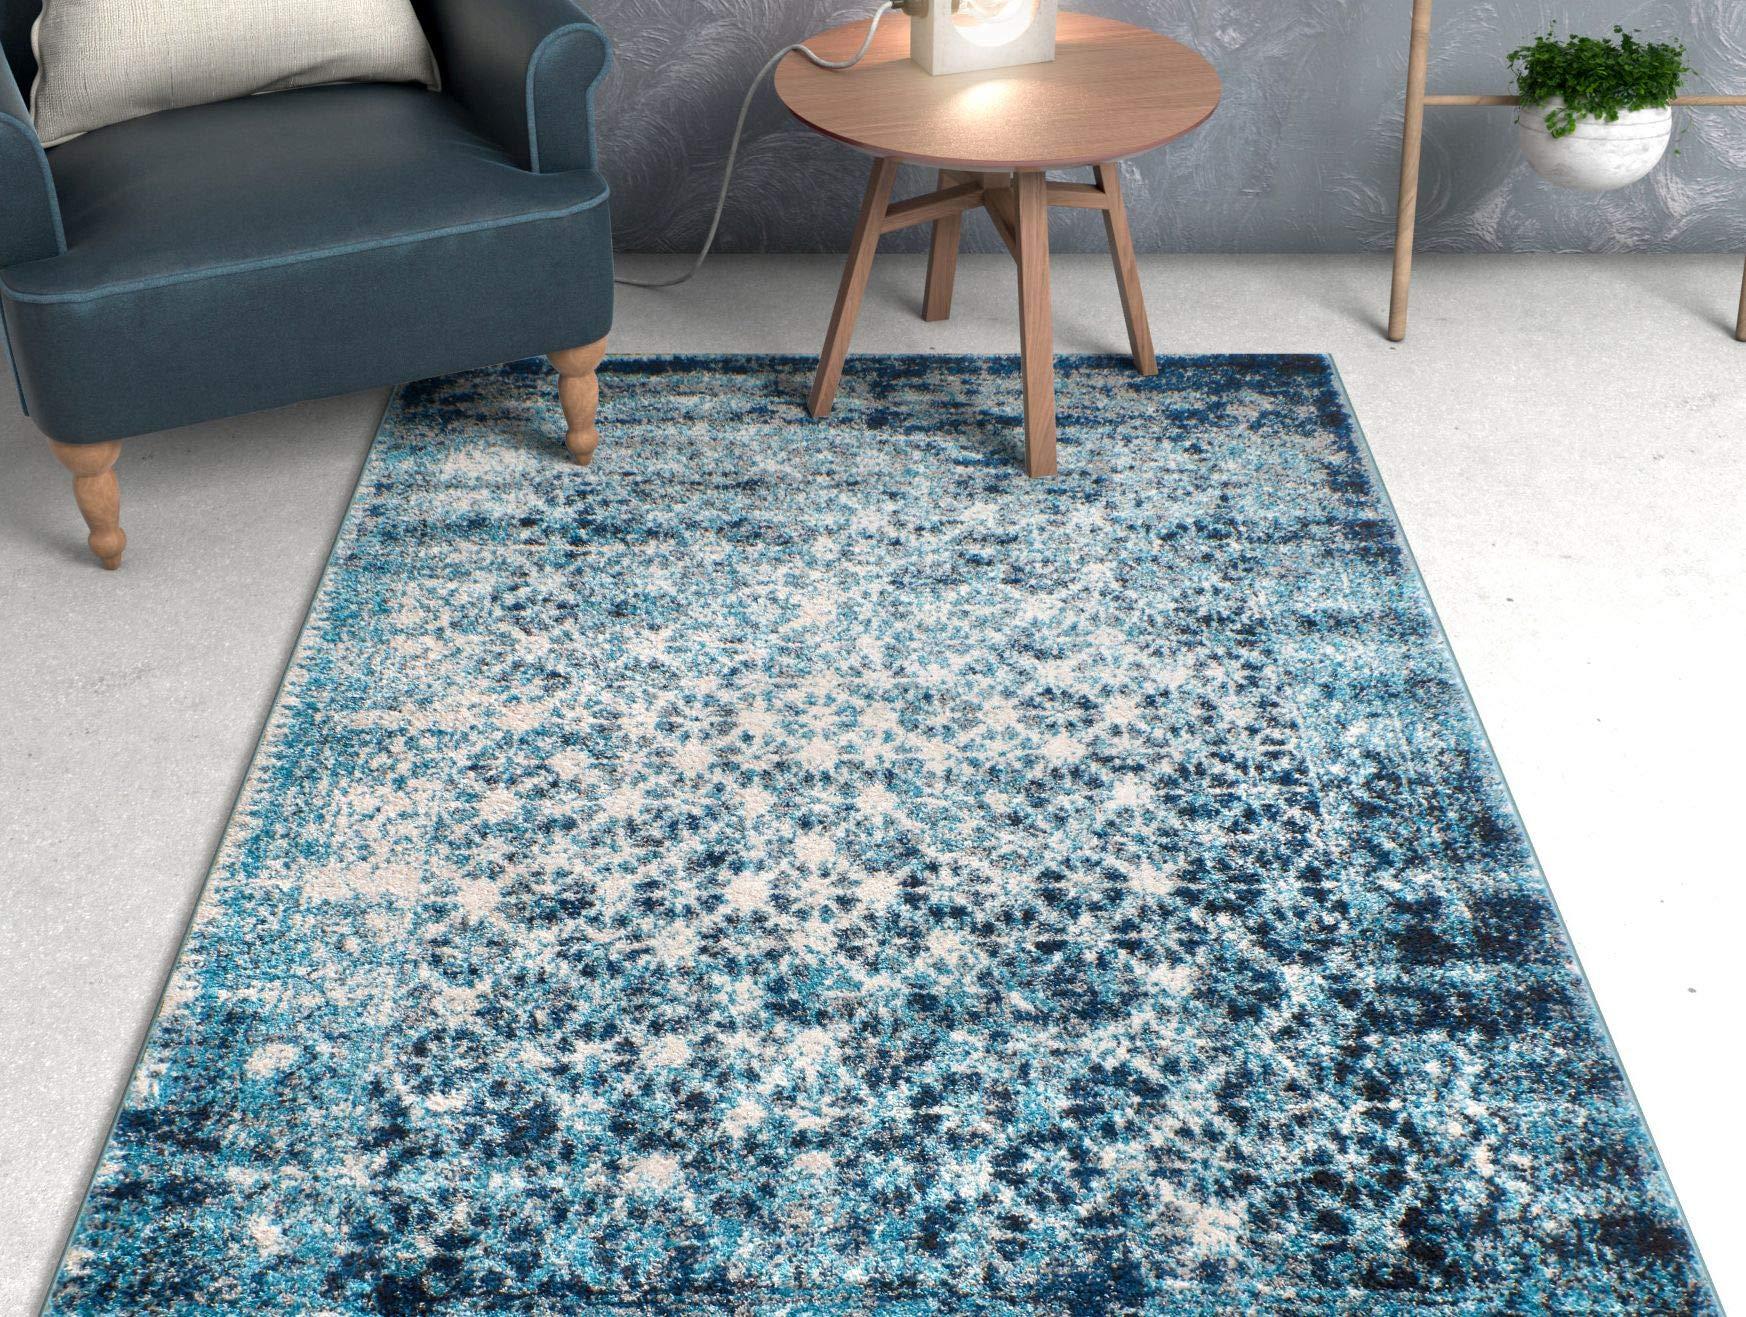 dark teal rug round well woven cheshire blue moroccan lattice vintage modern casual traditional trellis 5x7 53 dark teal rug amazoncom